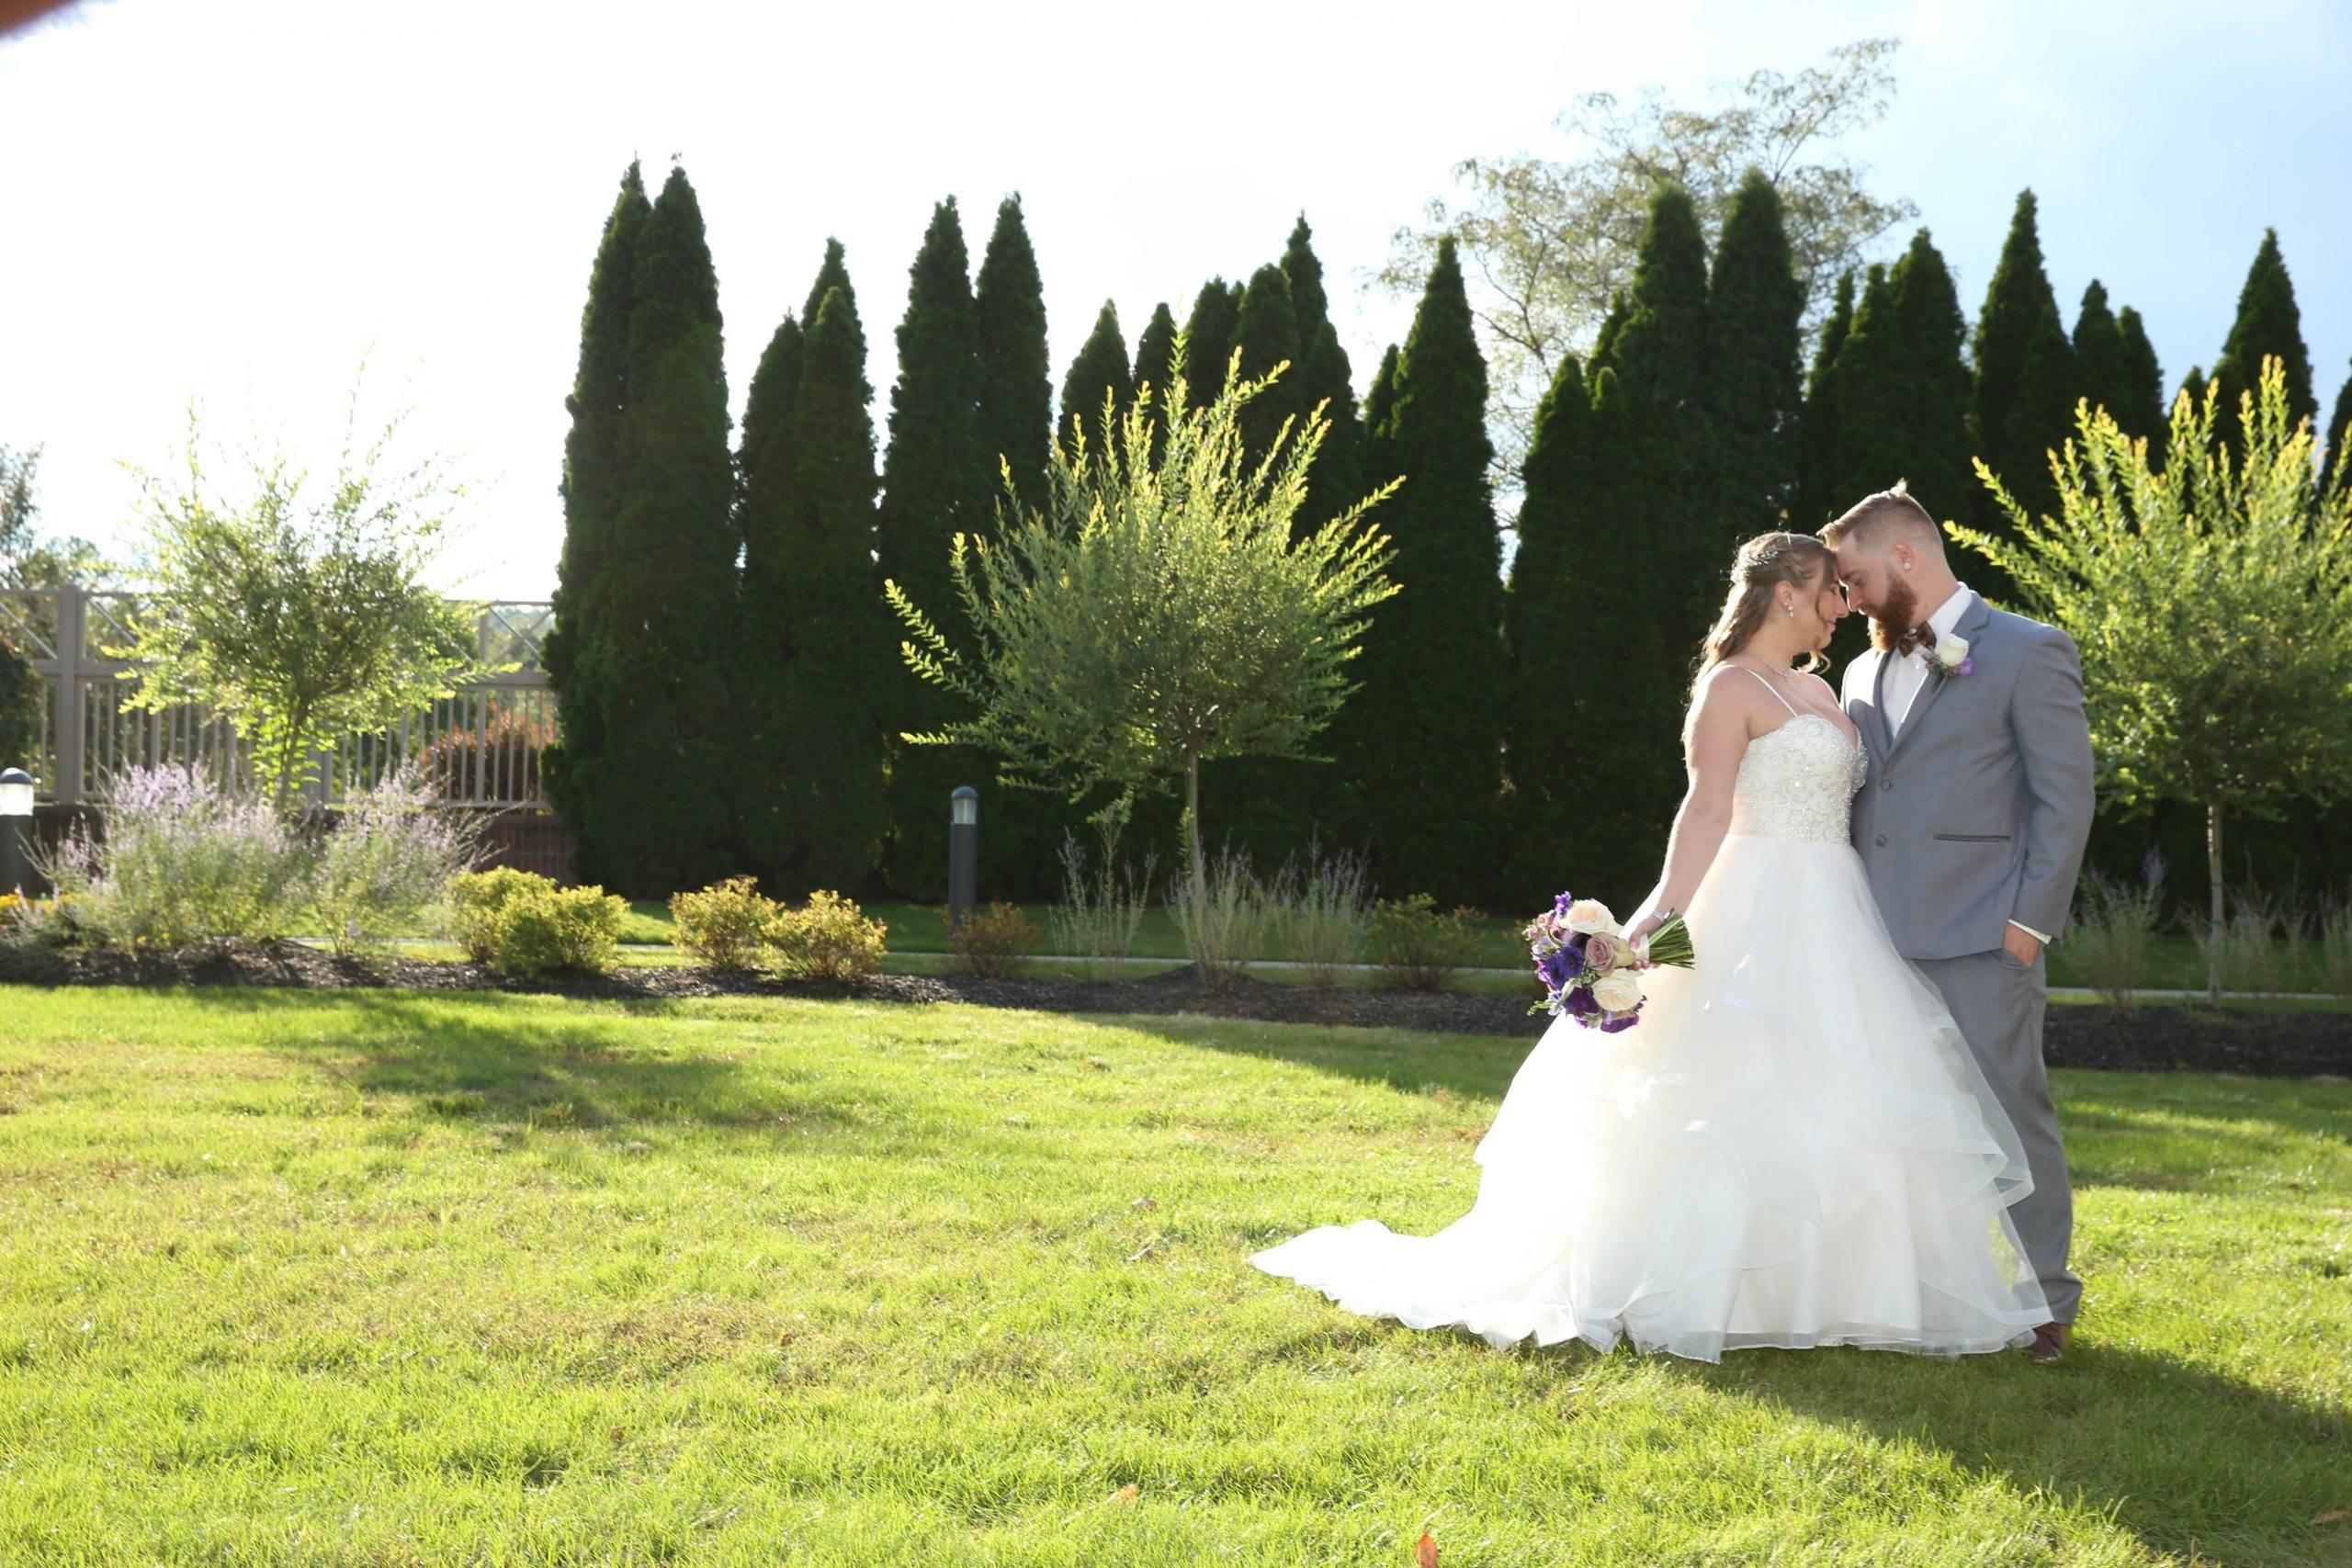 Primavera Regency bride and groom outside